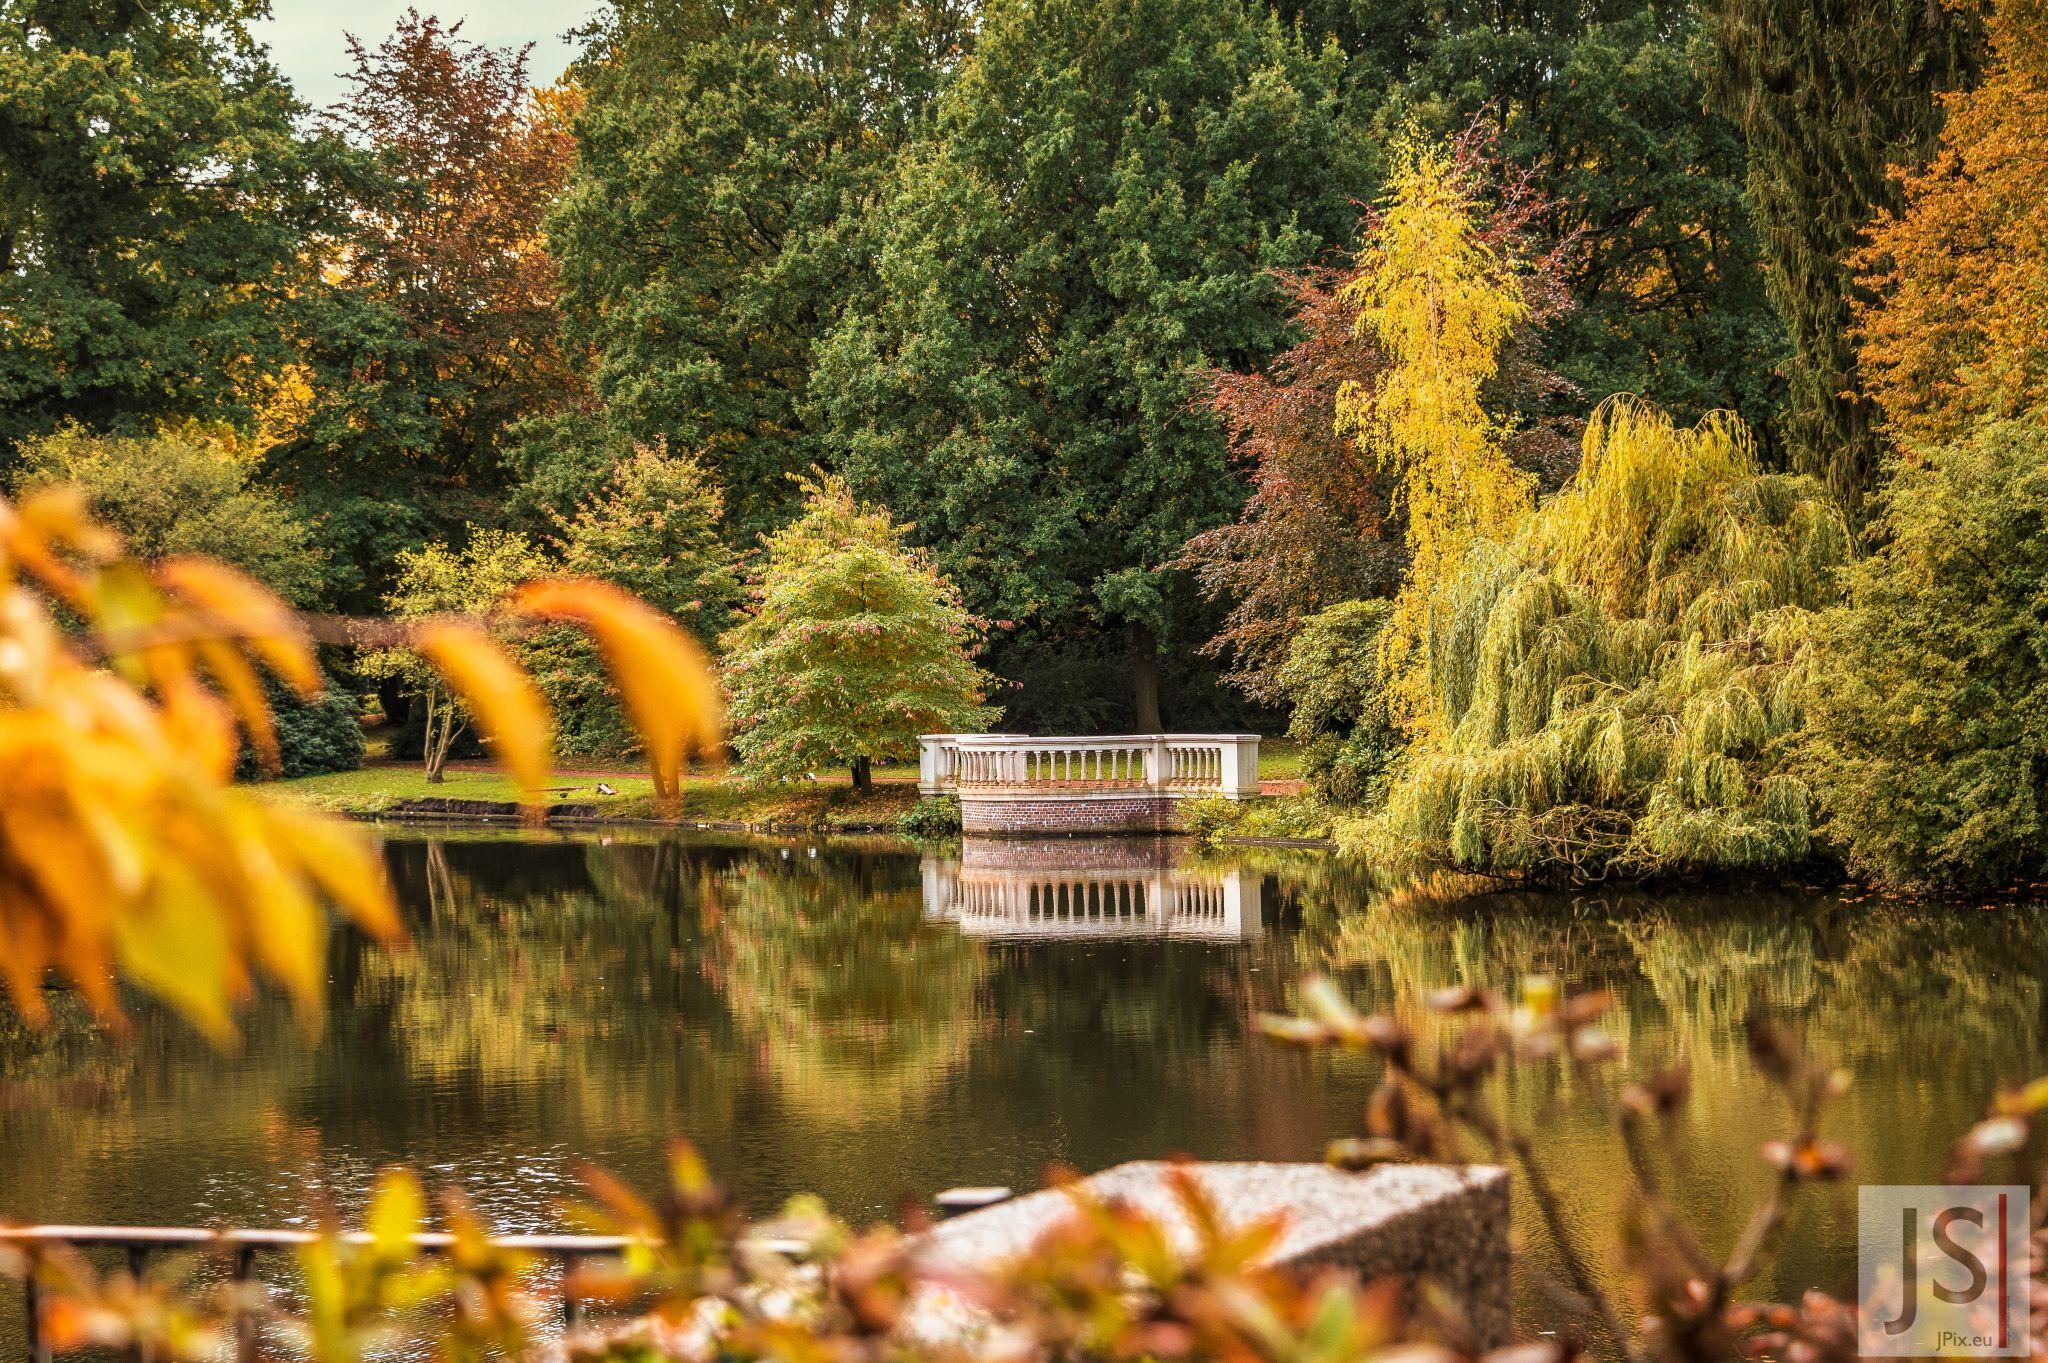 Schlossgarten Oldenburg, Germany